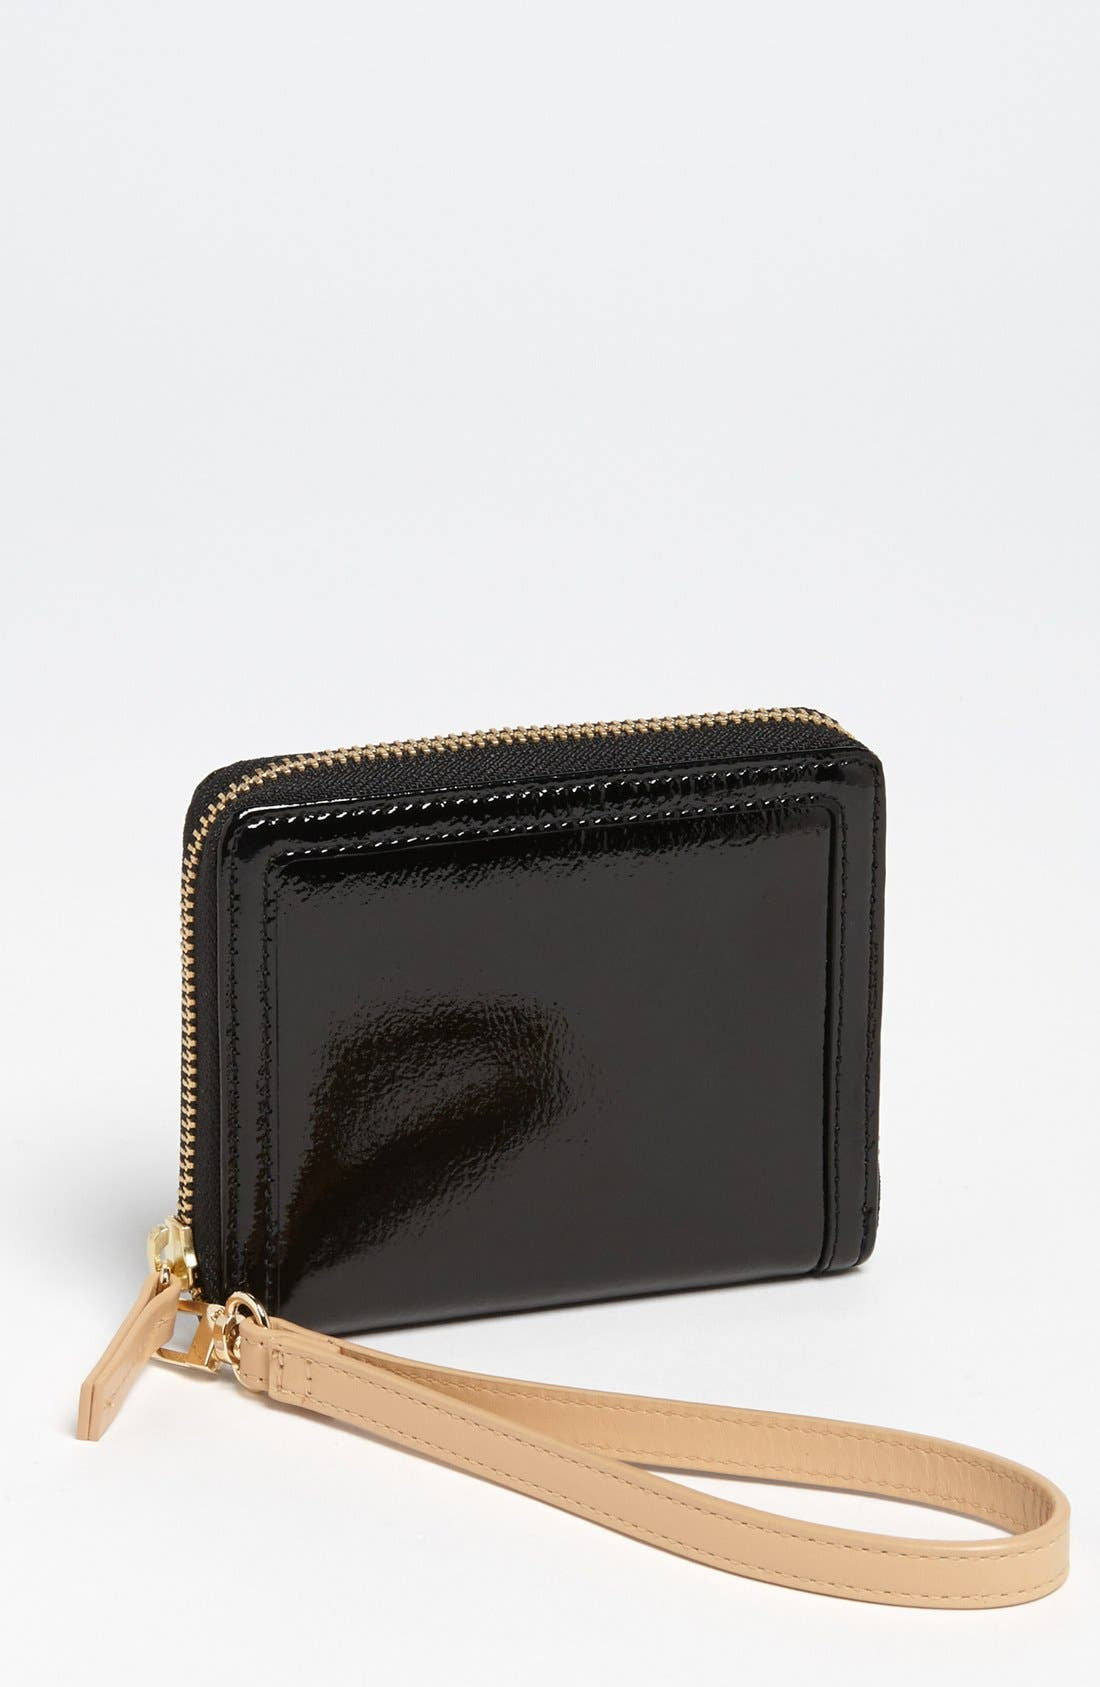 Main Image - Halogen 'Small' Leather Wristlet